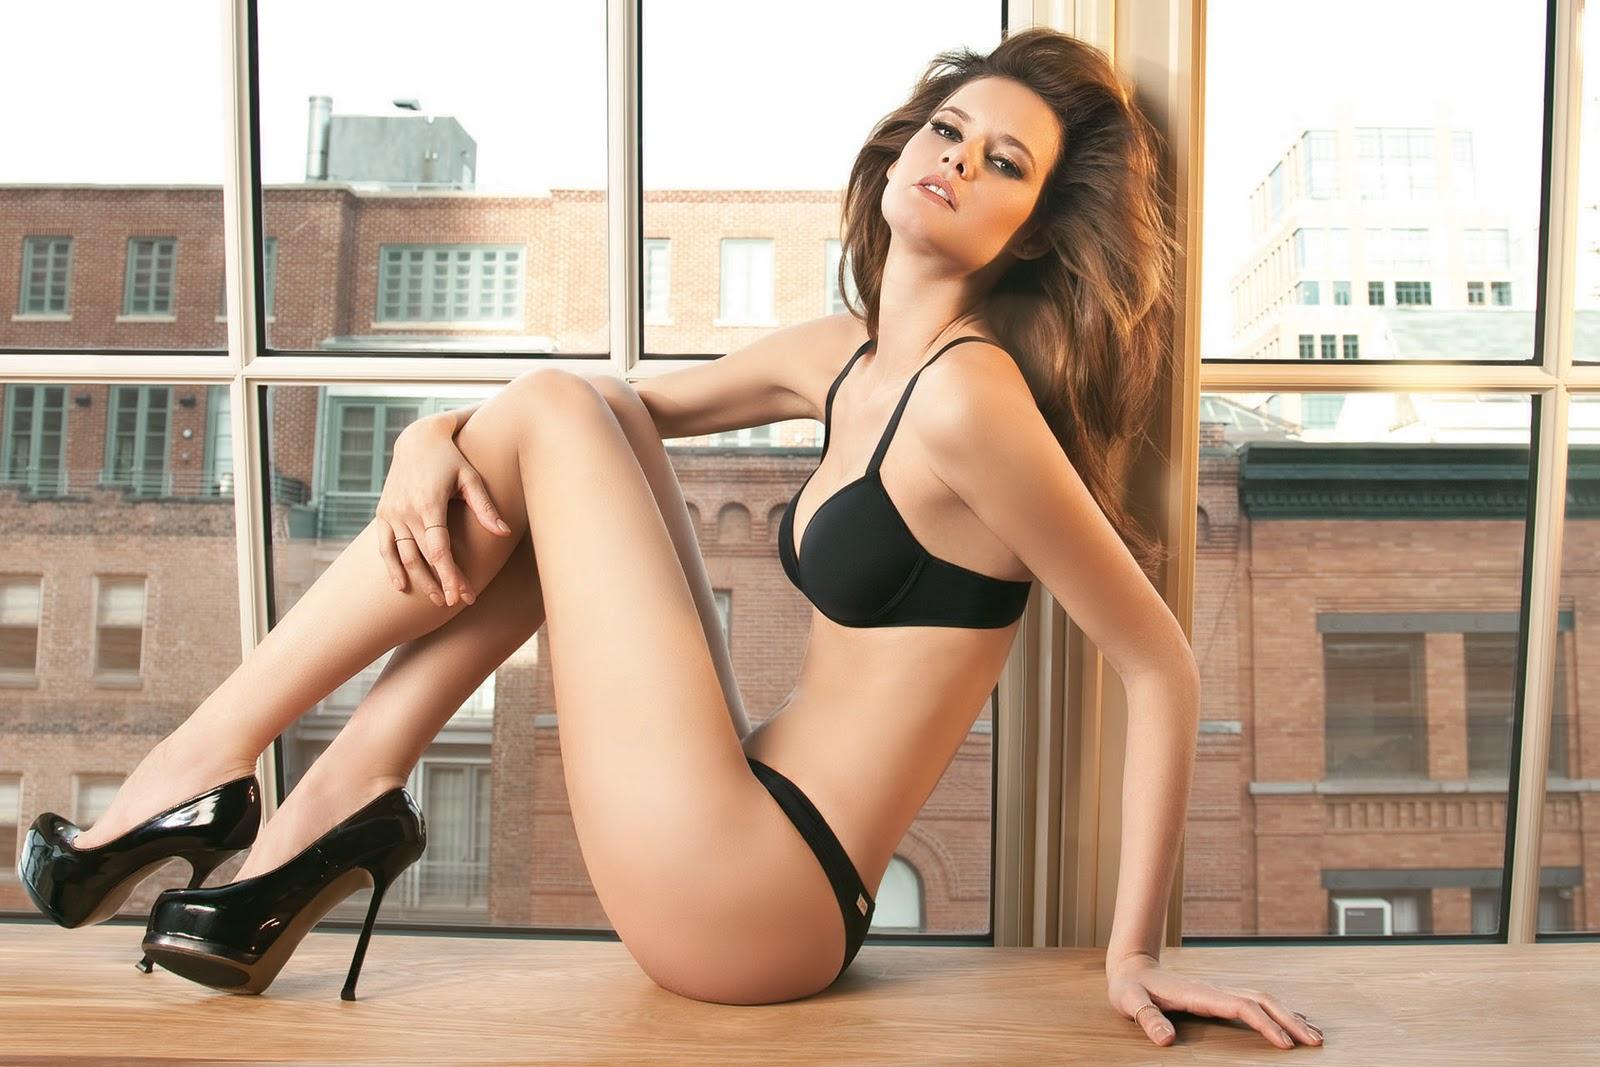 Hot Ana Cristina nudes (79 photo), Topless, Sideboobs, Twitter, panties 2018